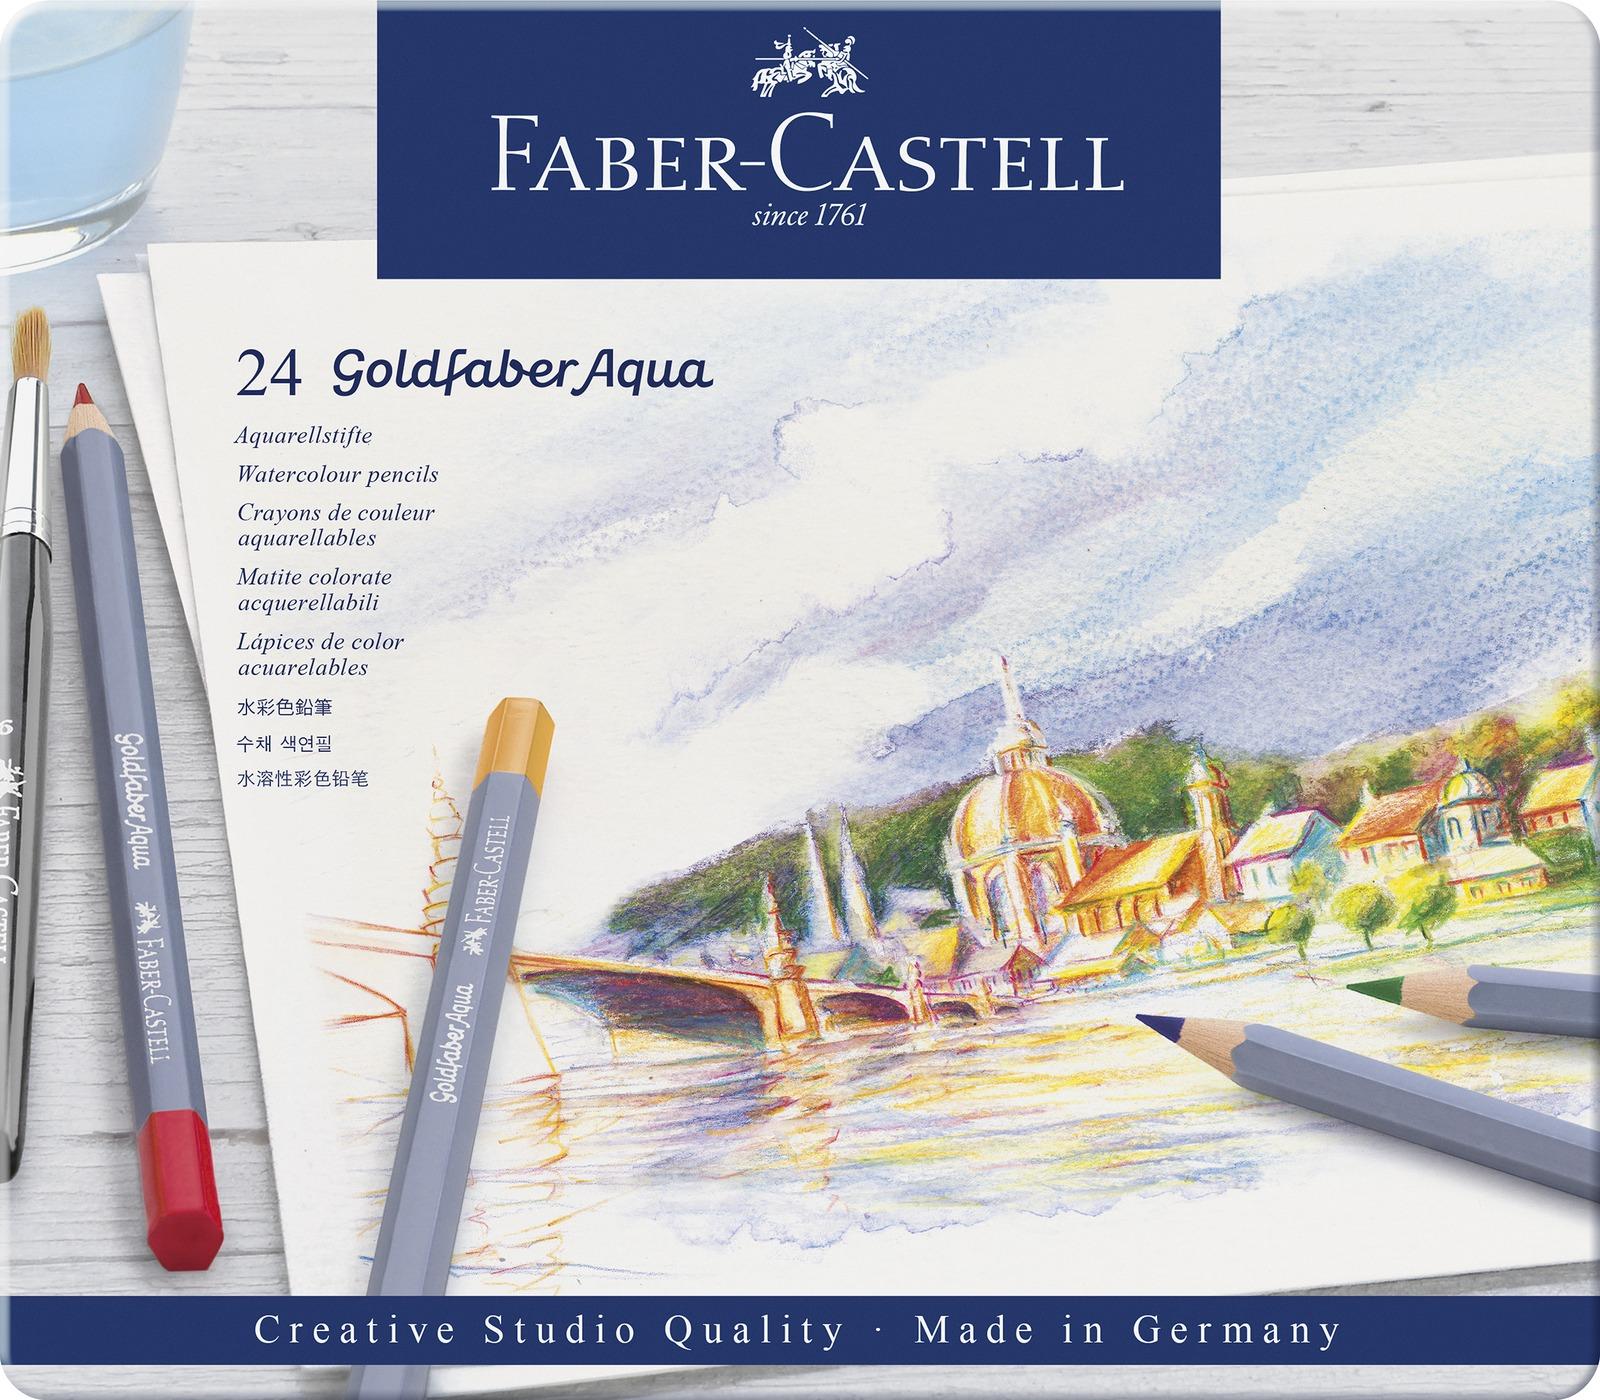 Faber-Castell: Goldfaber Aqua (Tin of 24) image